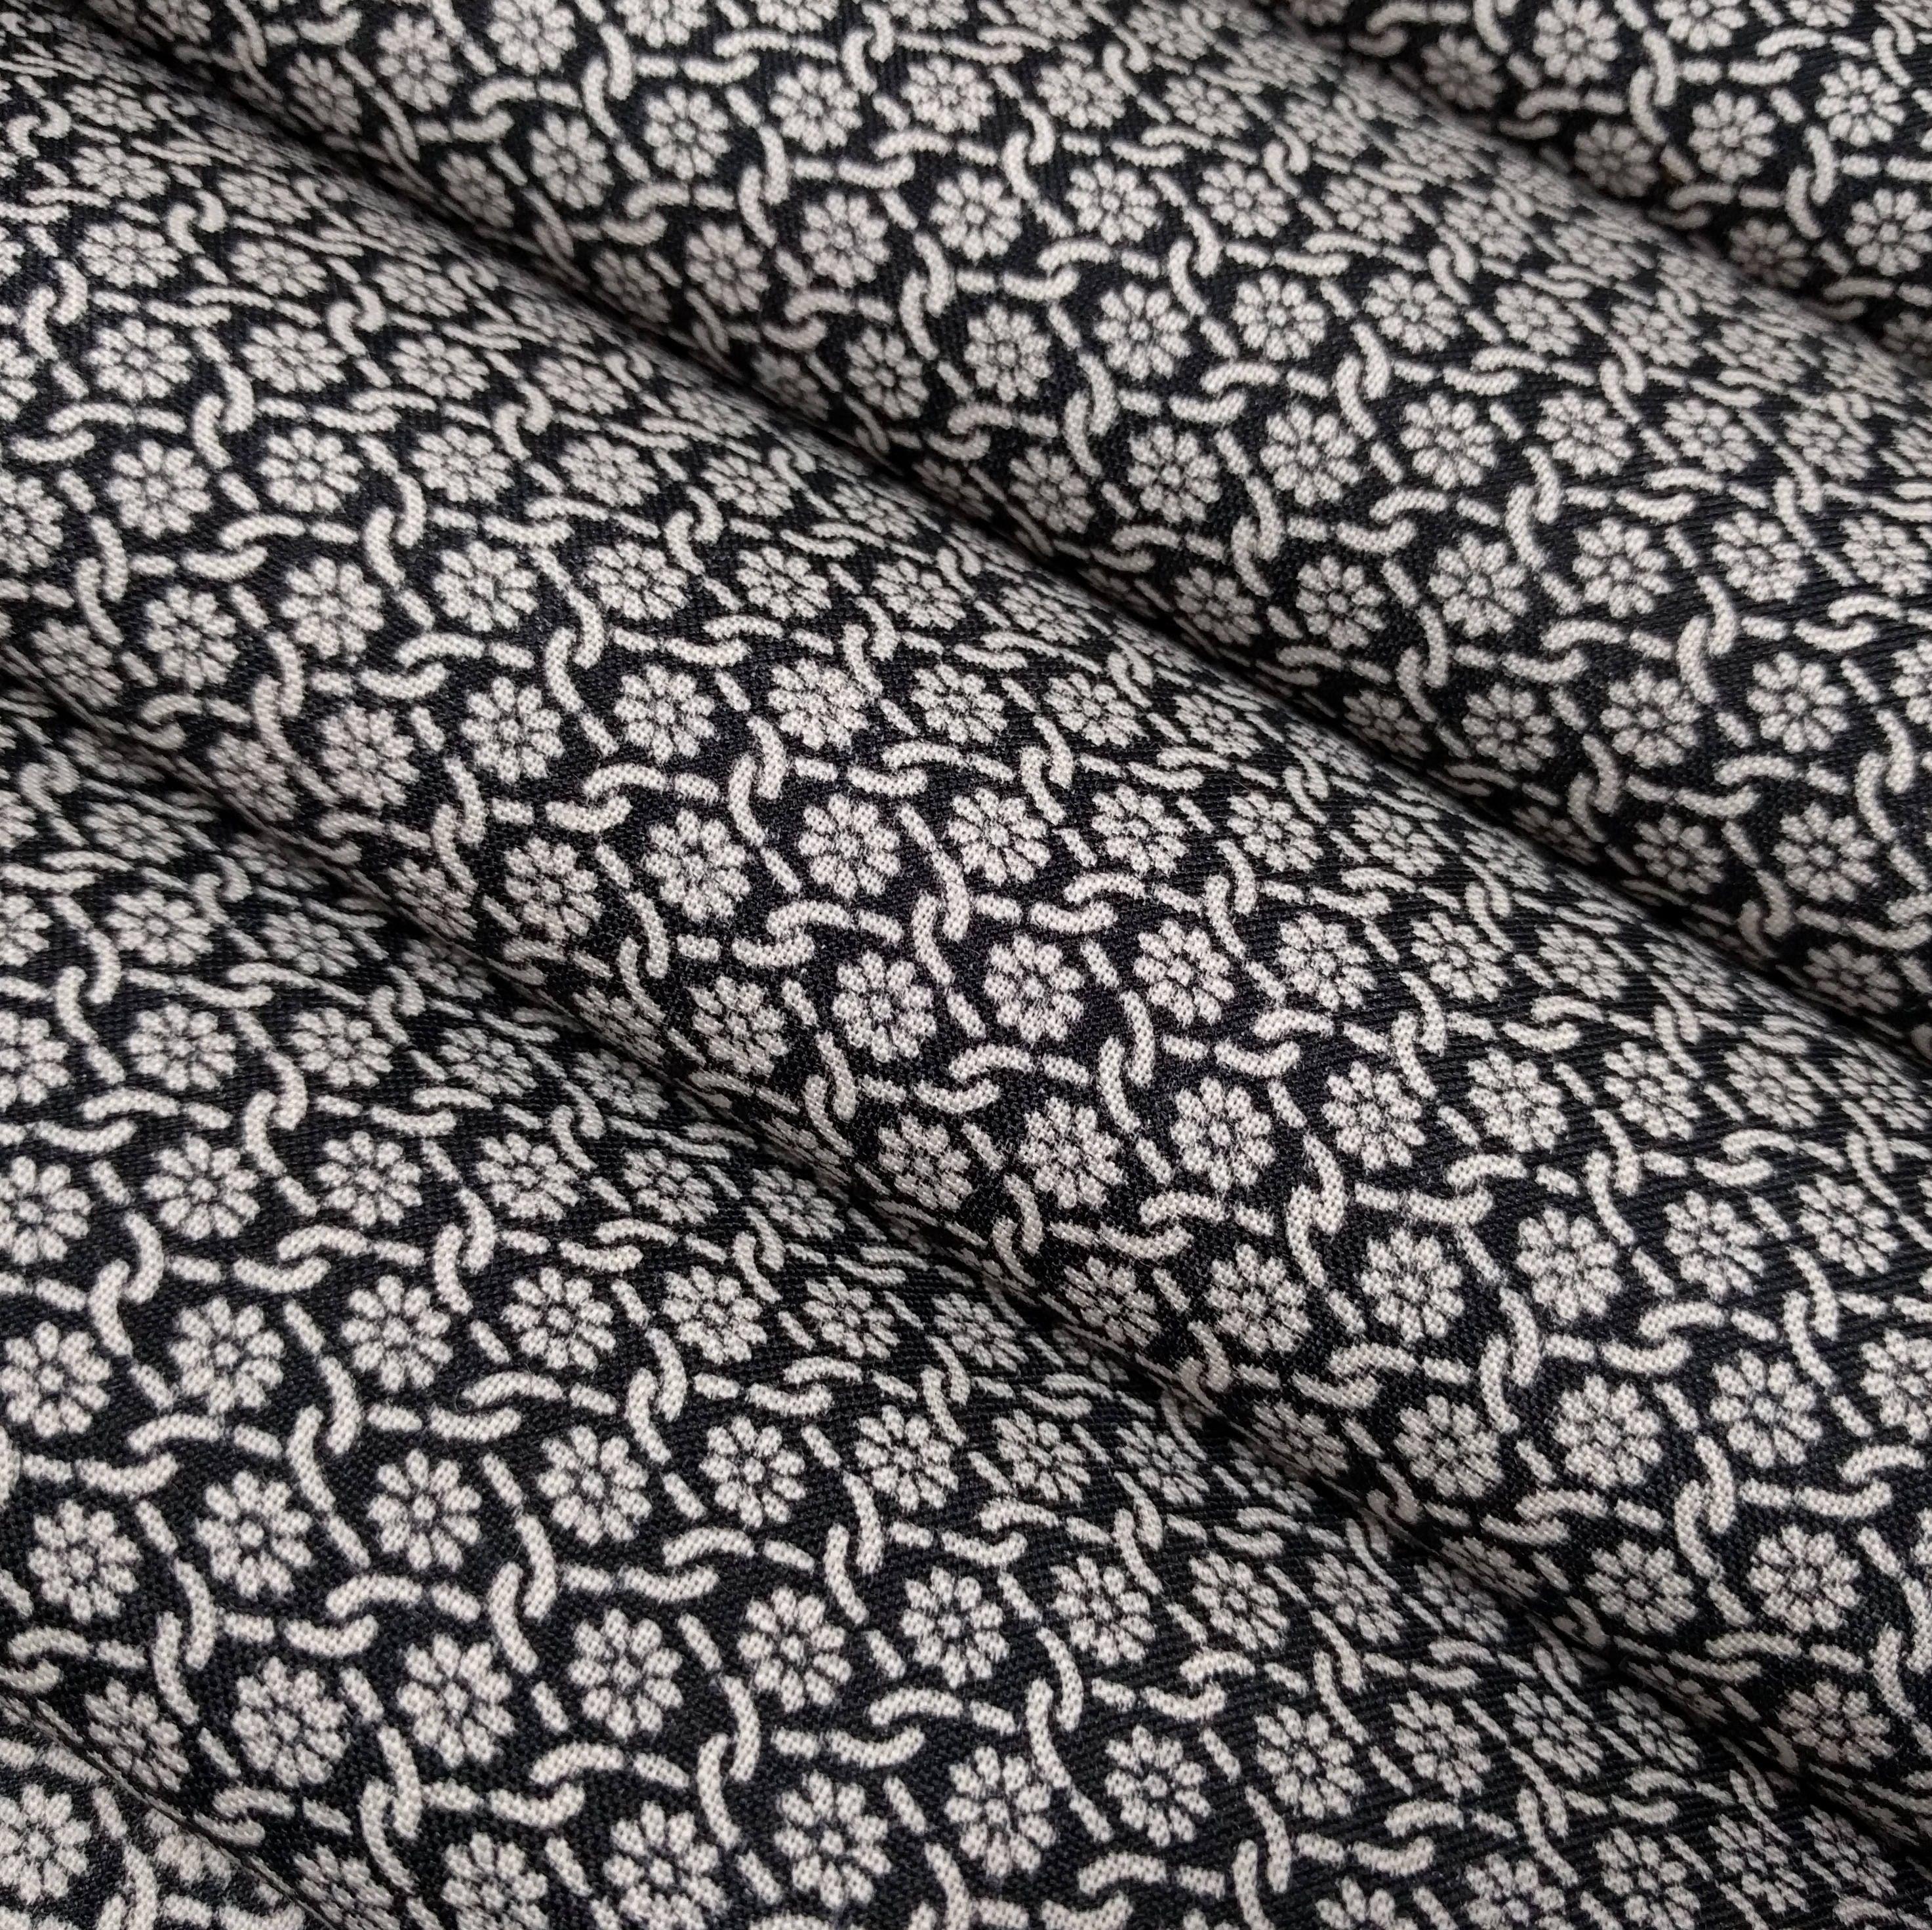 Vintage Black With White Floral Wool Kimono Fabric By The Yard Kimono Fabric Fabric Japanese Fabric